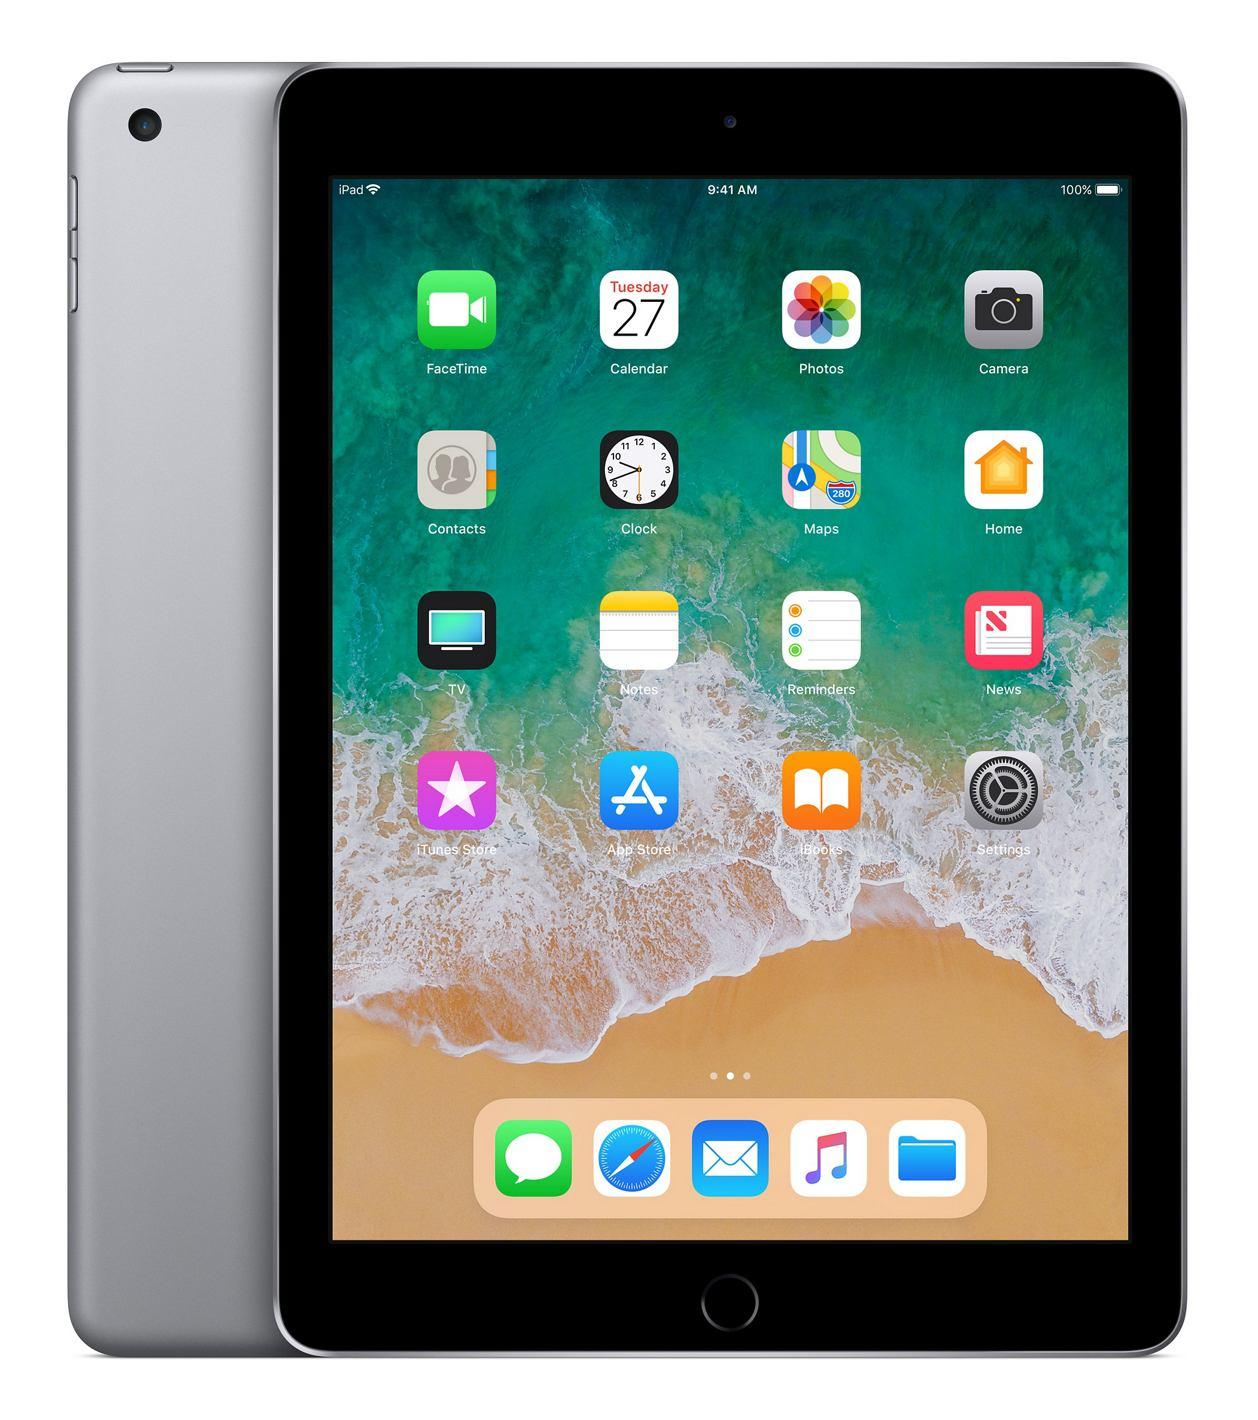 2022274-Apple-iPad-32-GB-Grigio-Apple-iPad-9-7-INCH-WiFi-32GB-2018-S-Grey